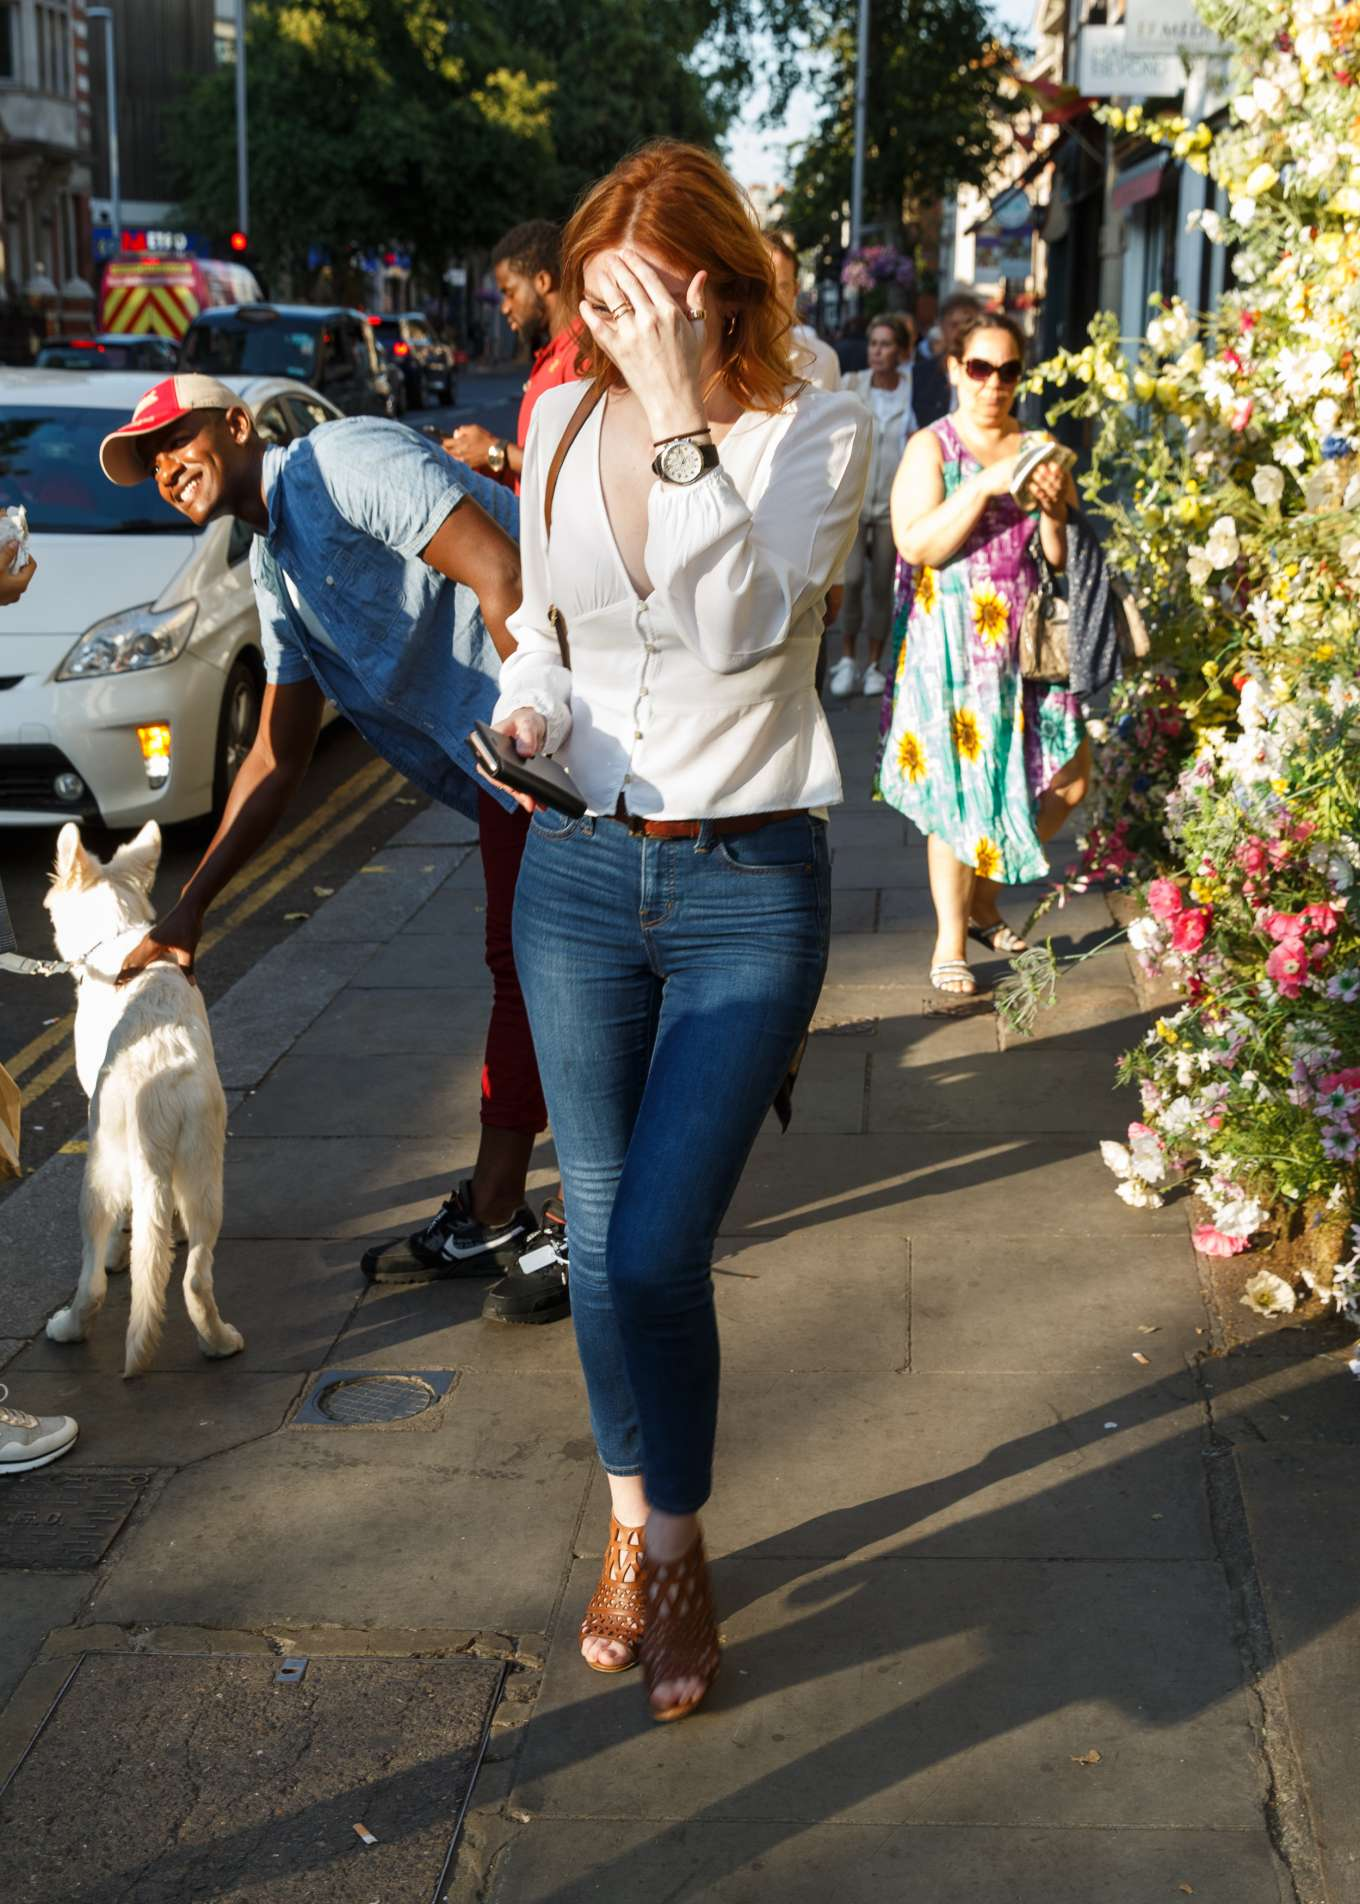 Eleanor Tomlinson - Leaving Ivy Chelsea Garden in London